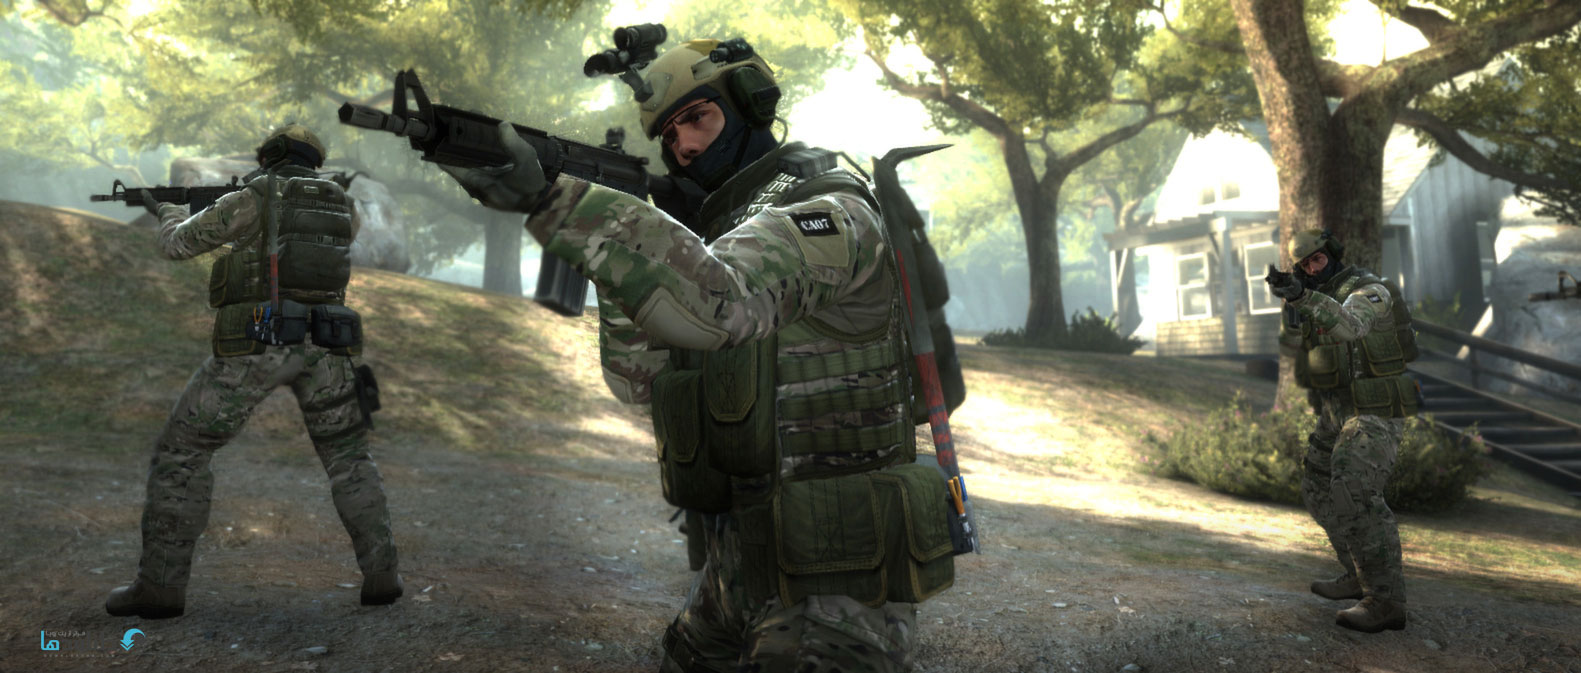 http://img5.downloadha.com/hosein/Game/February%202015/27/CS-GO-screenshots-06-large.jpg